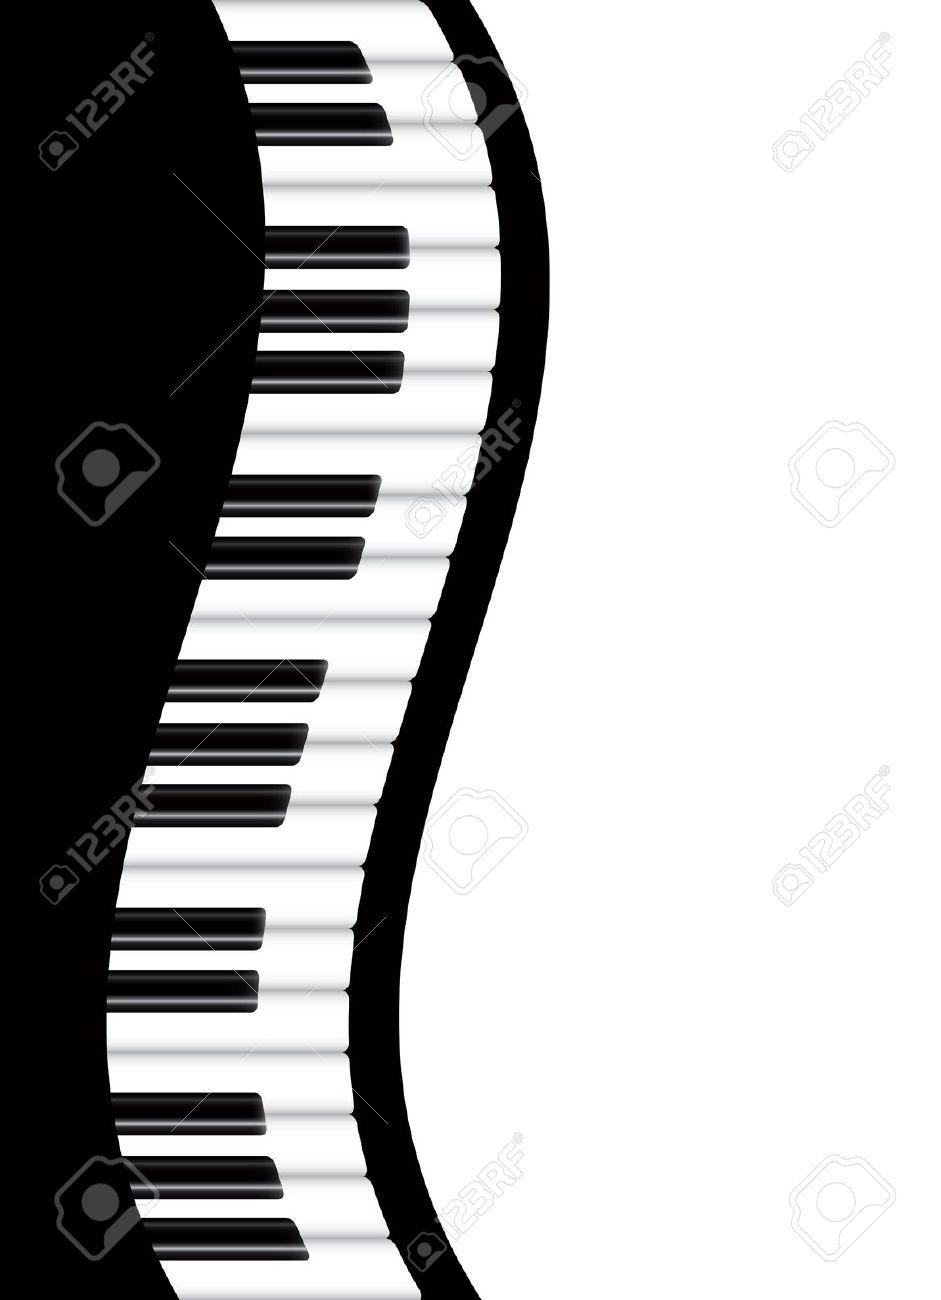 941x1300 Piano Keyboard Clip Art Border Clipart